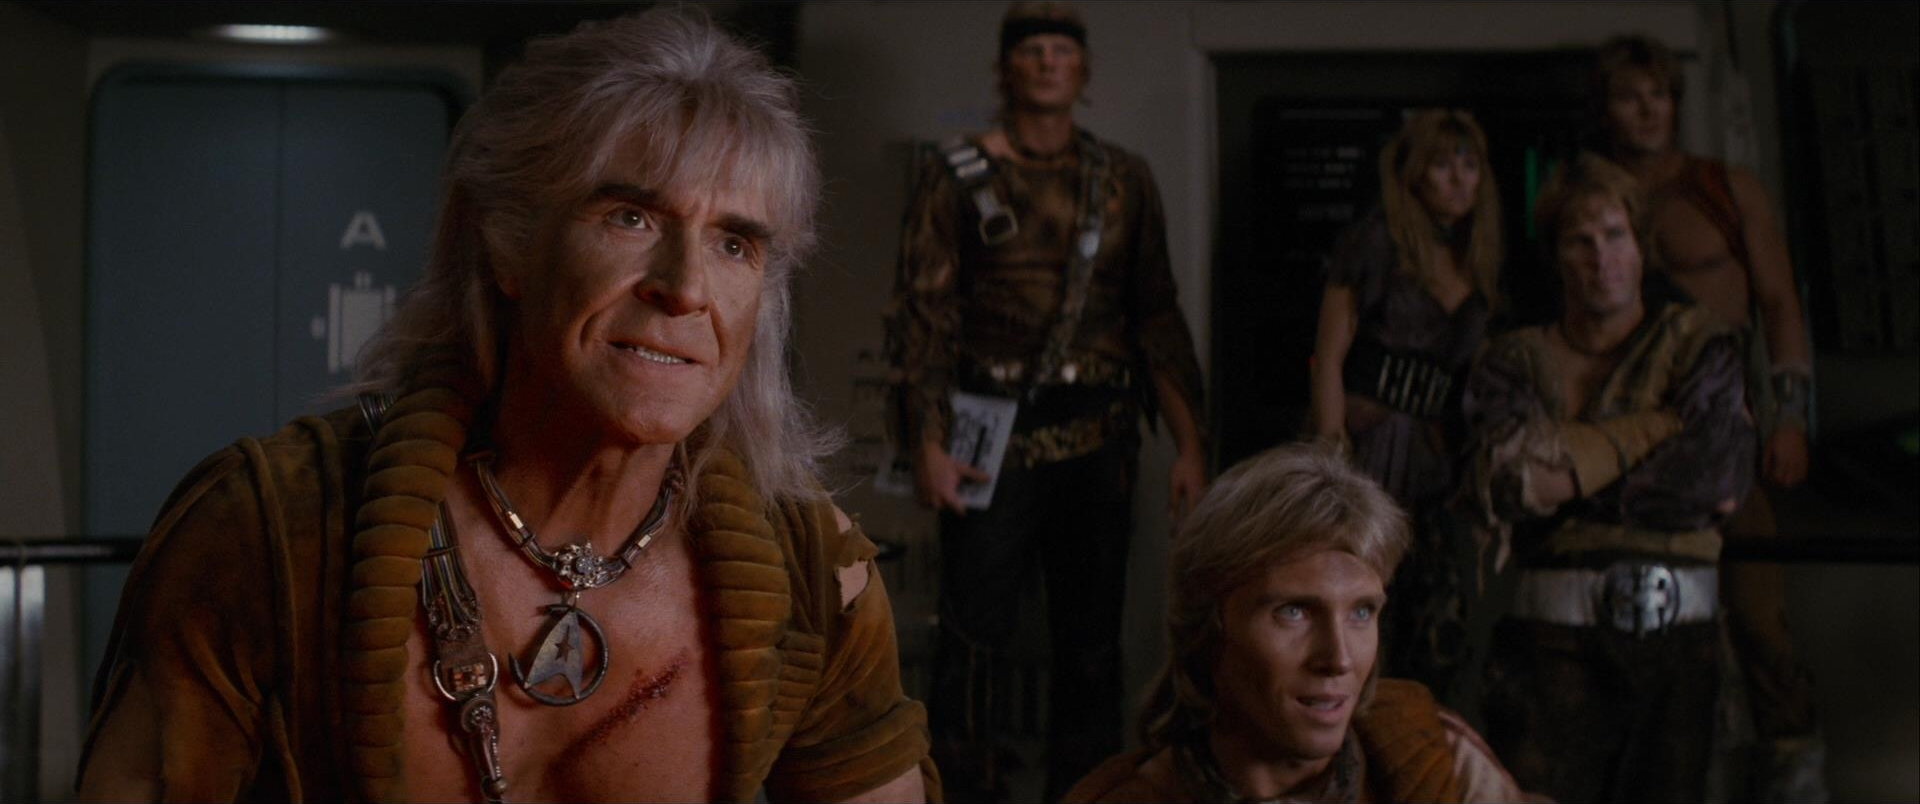 Star Trek: The Wrath of Khan - Khan